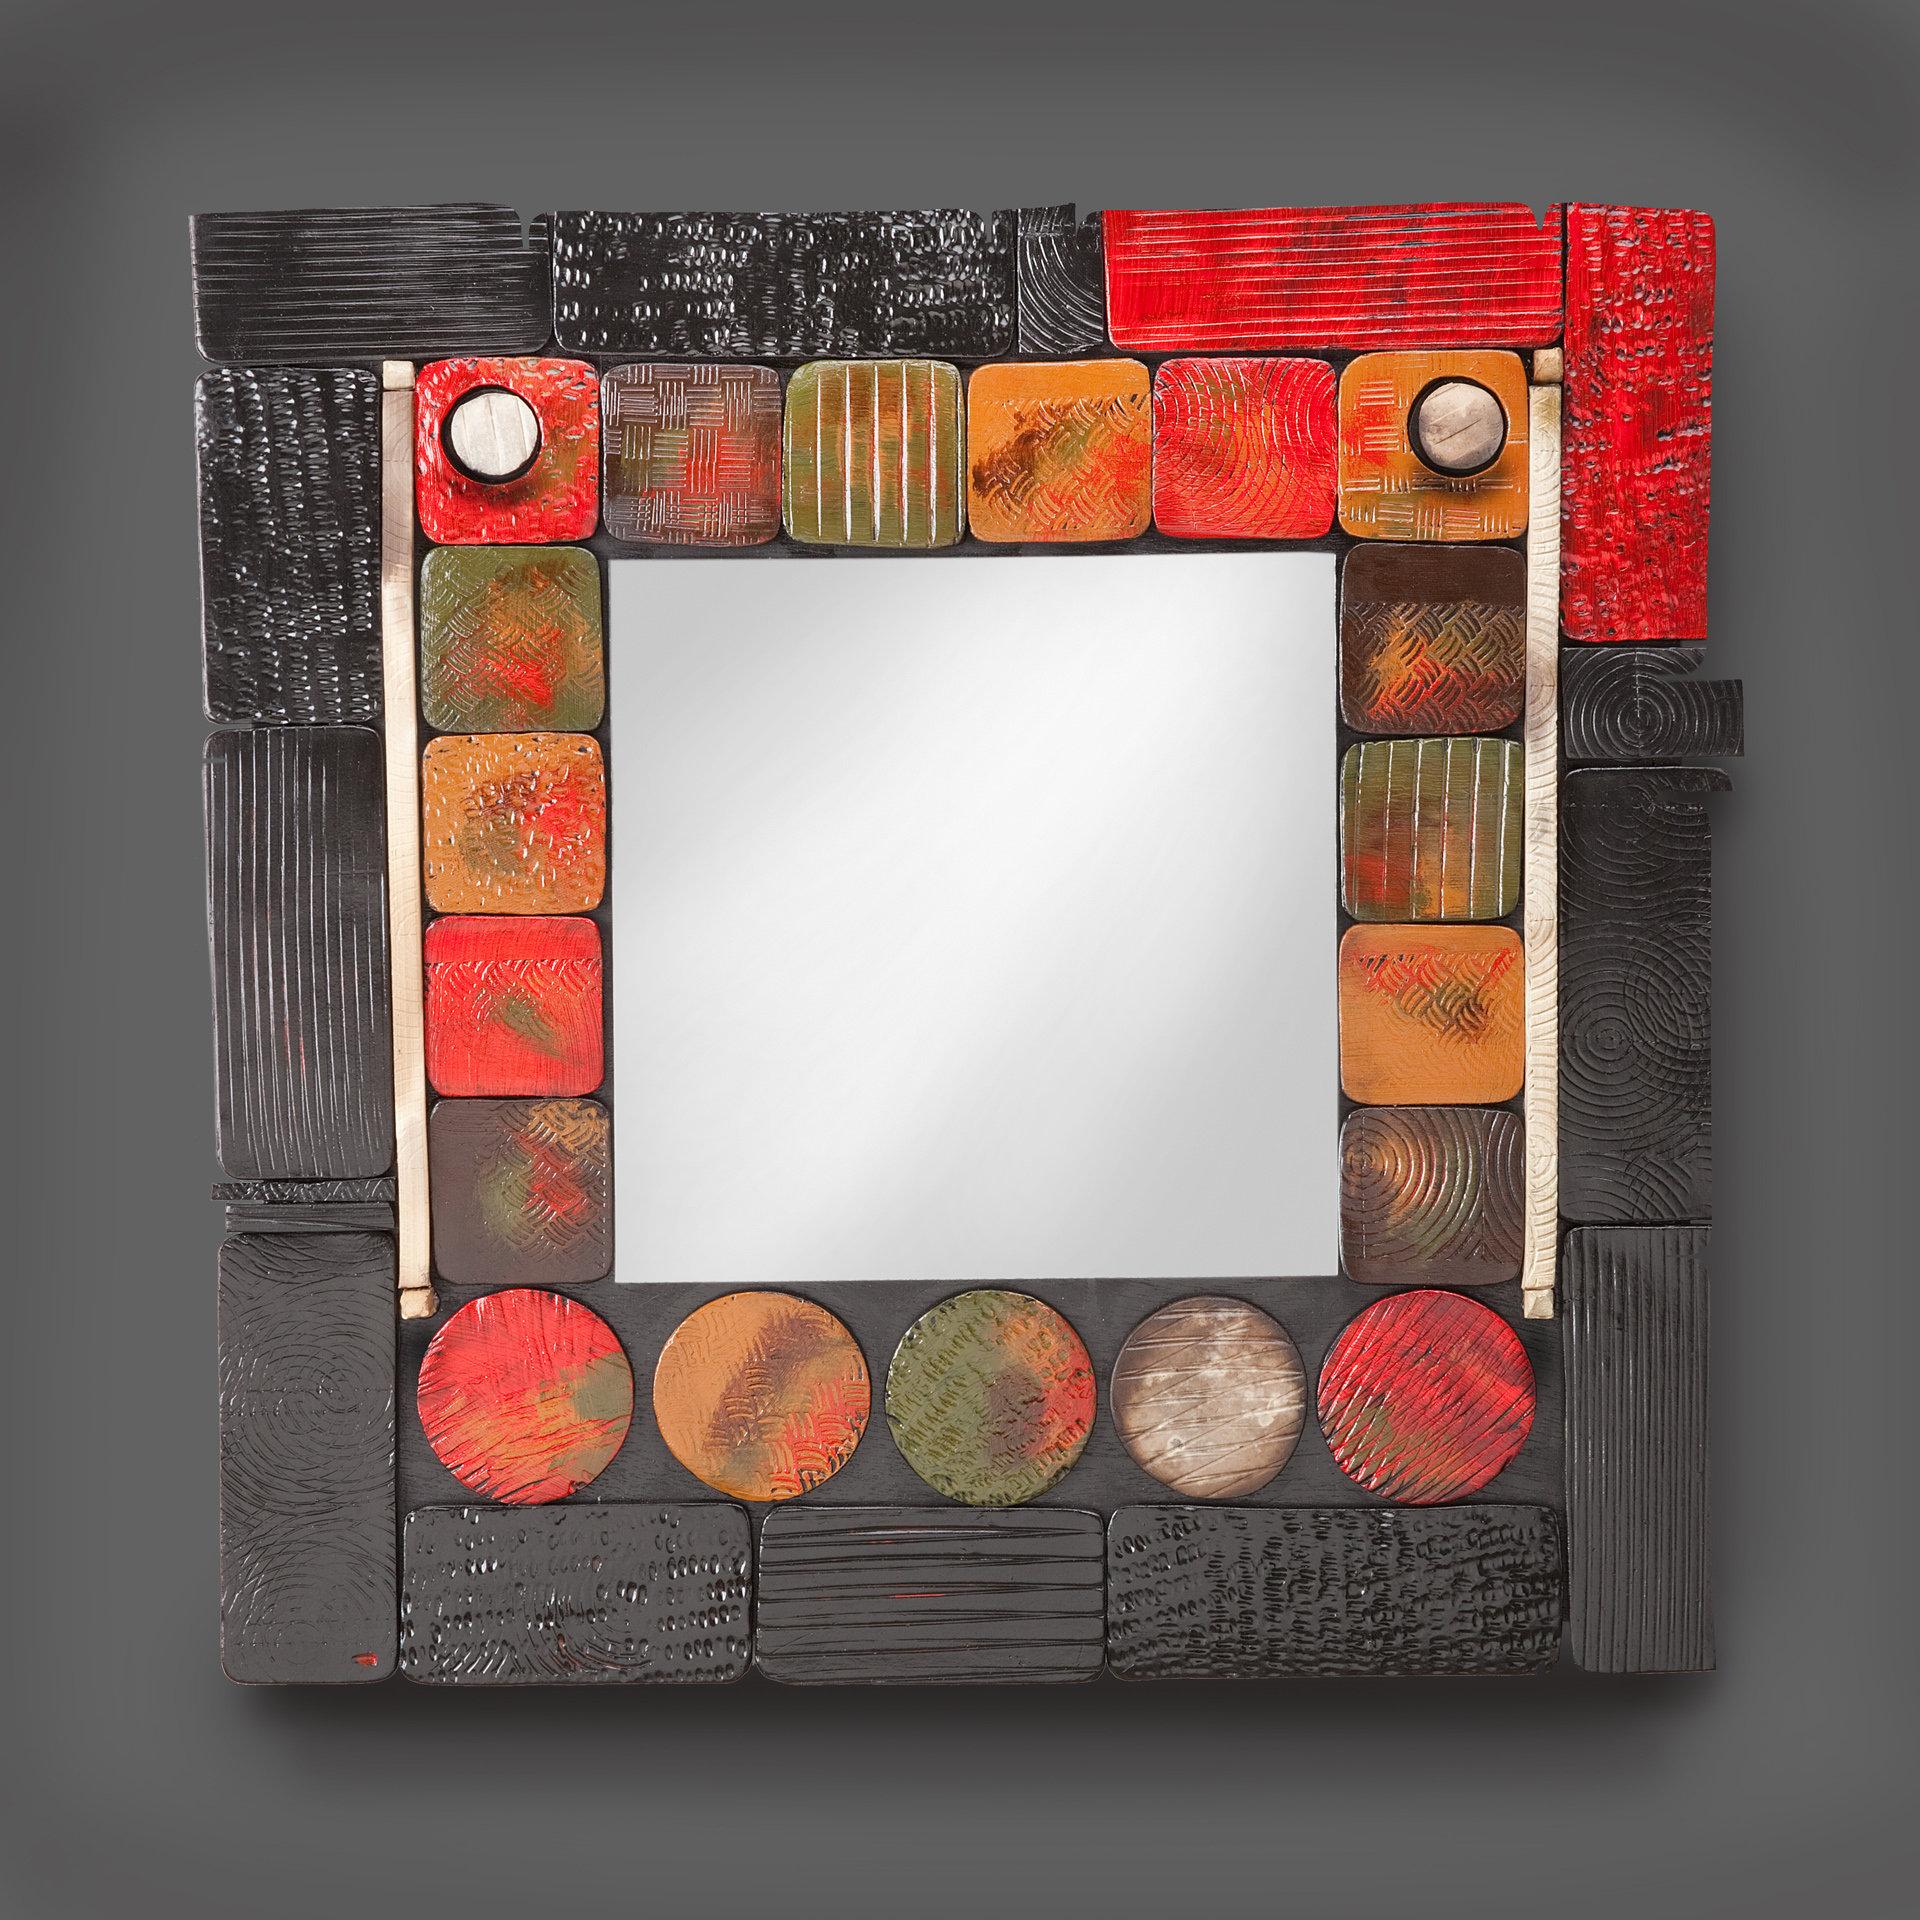 creative handmade mirrors - HD1920×1920